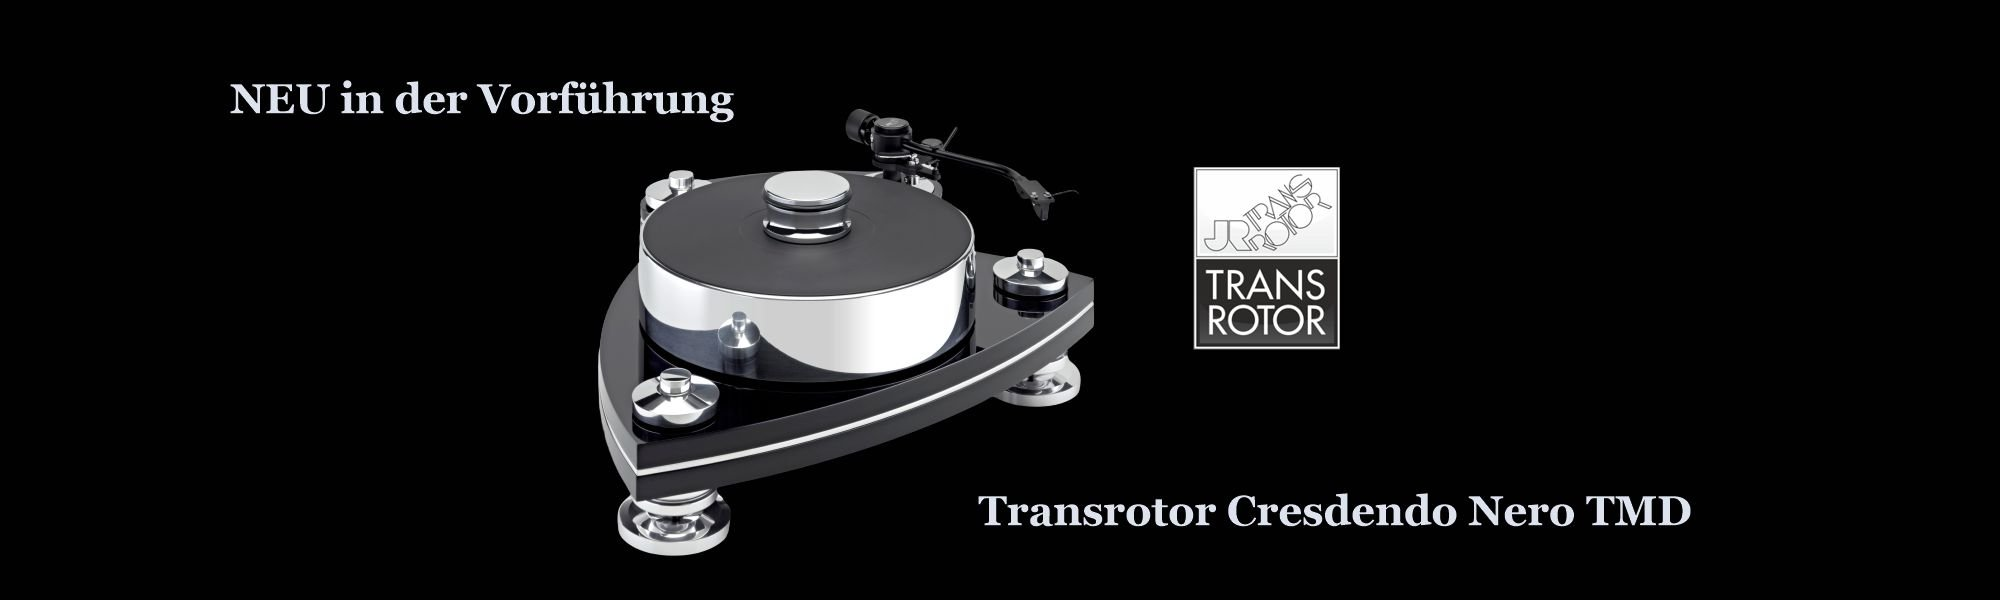 Transrotor Plattenspieler Laufwerk Crescendo Nero